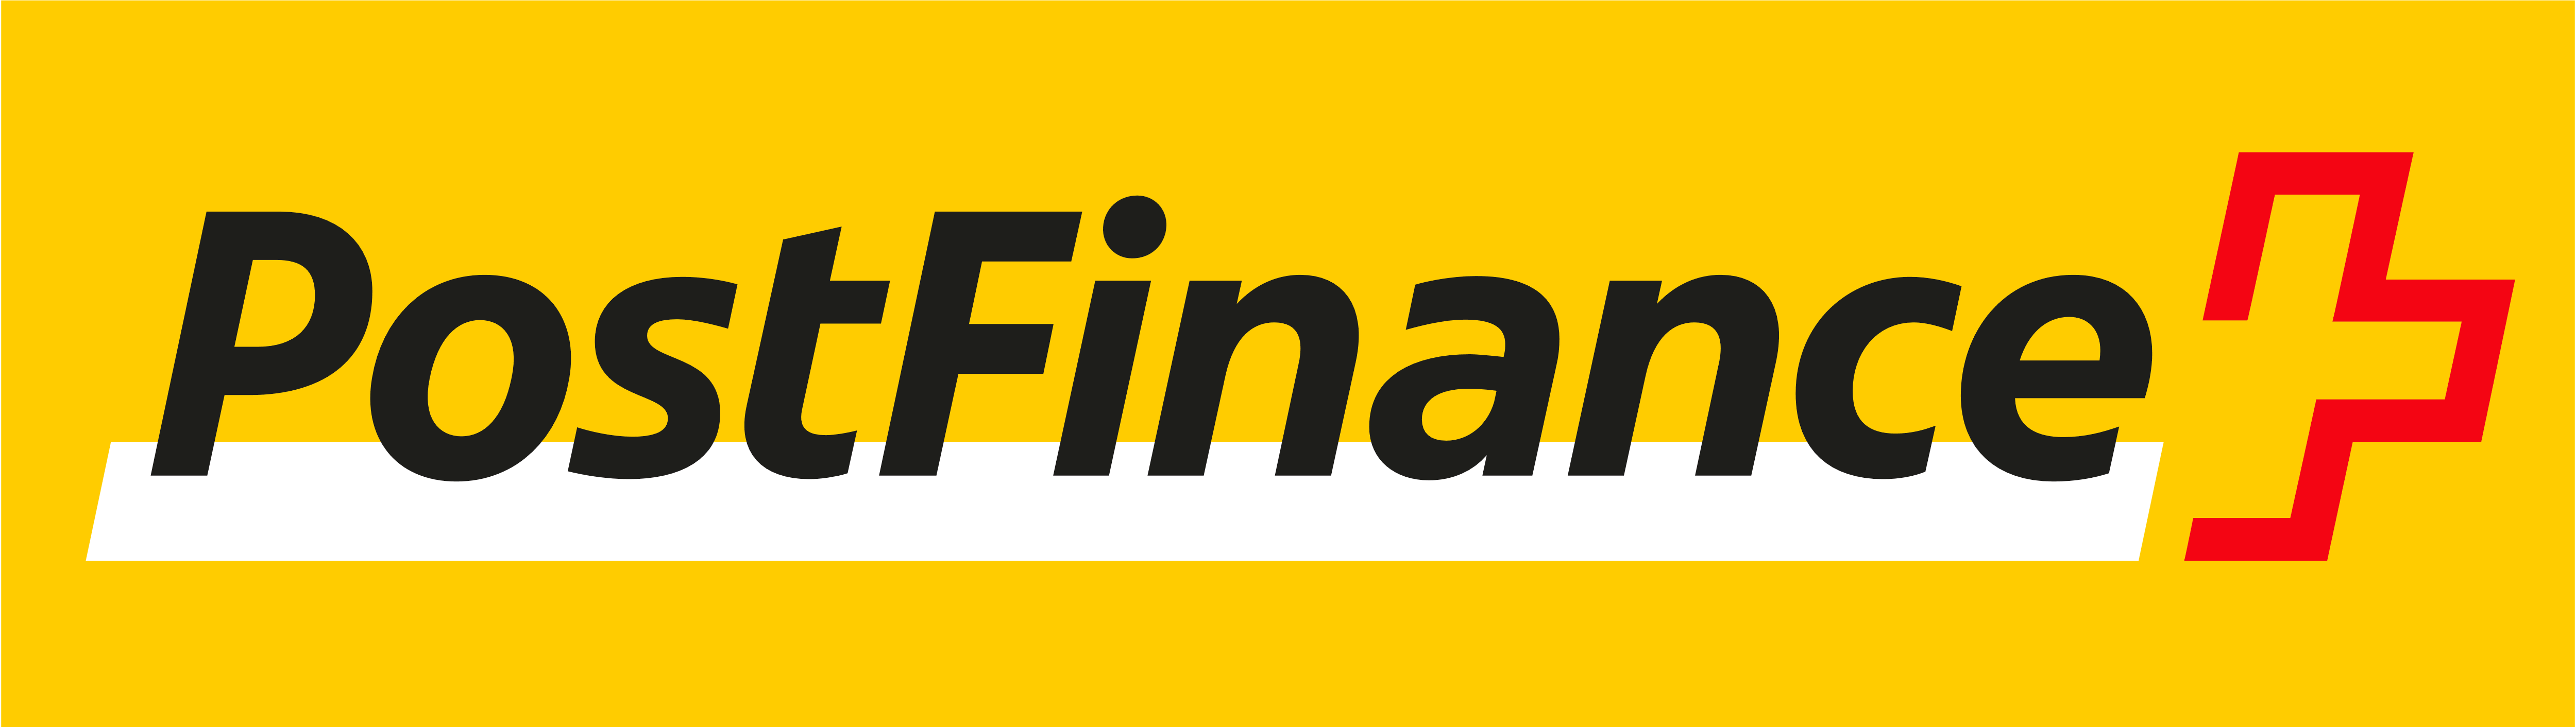 PostFinance_logo.png